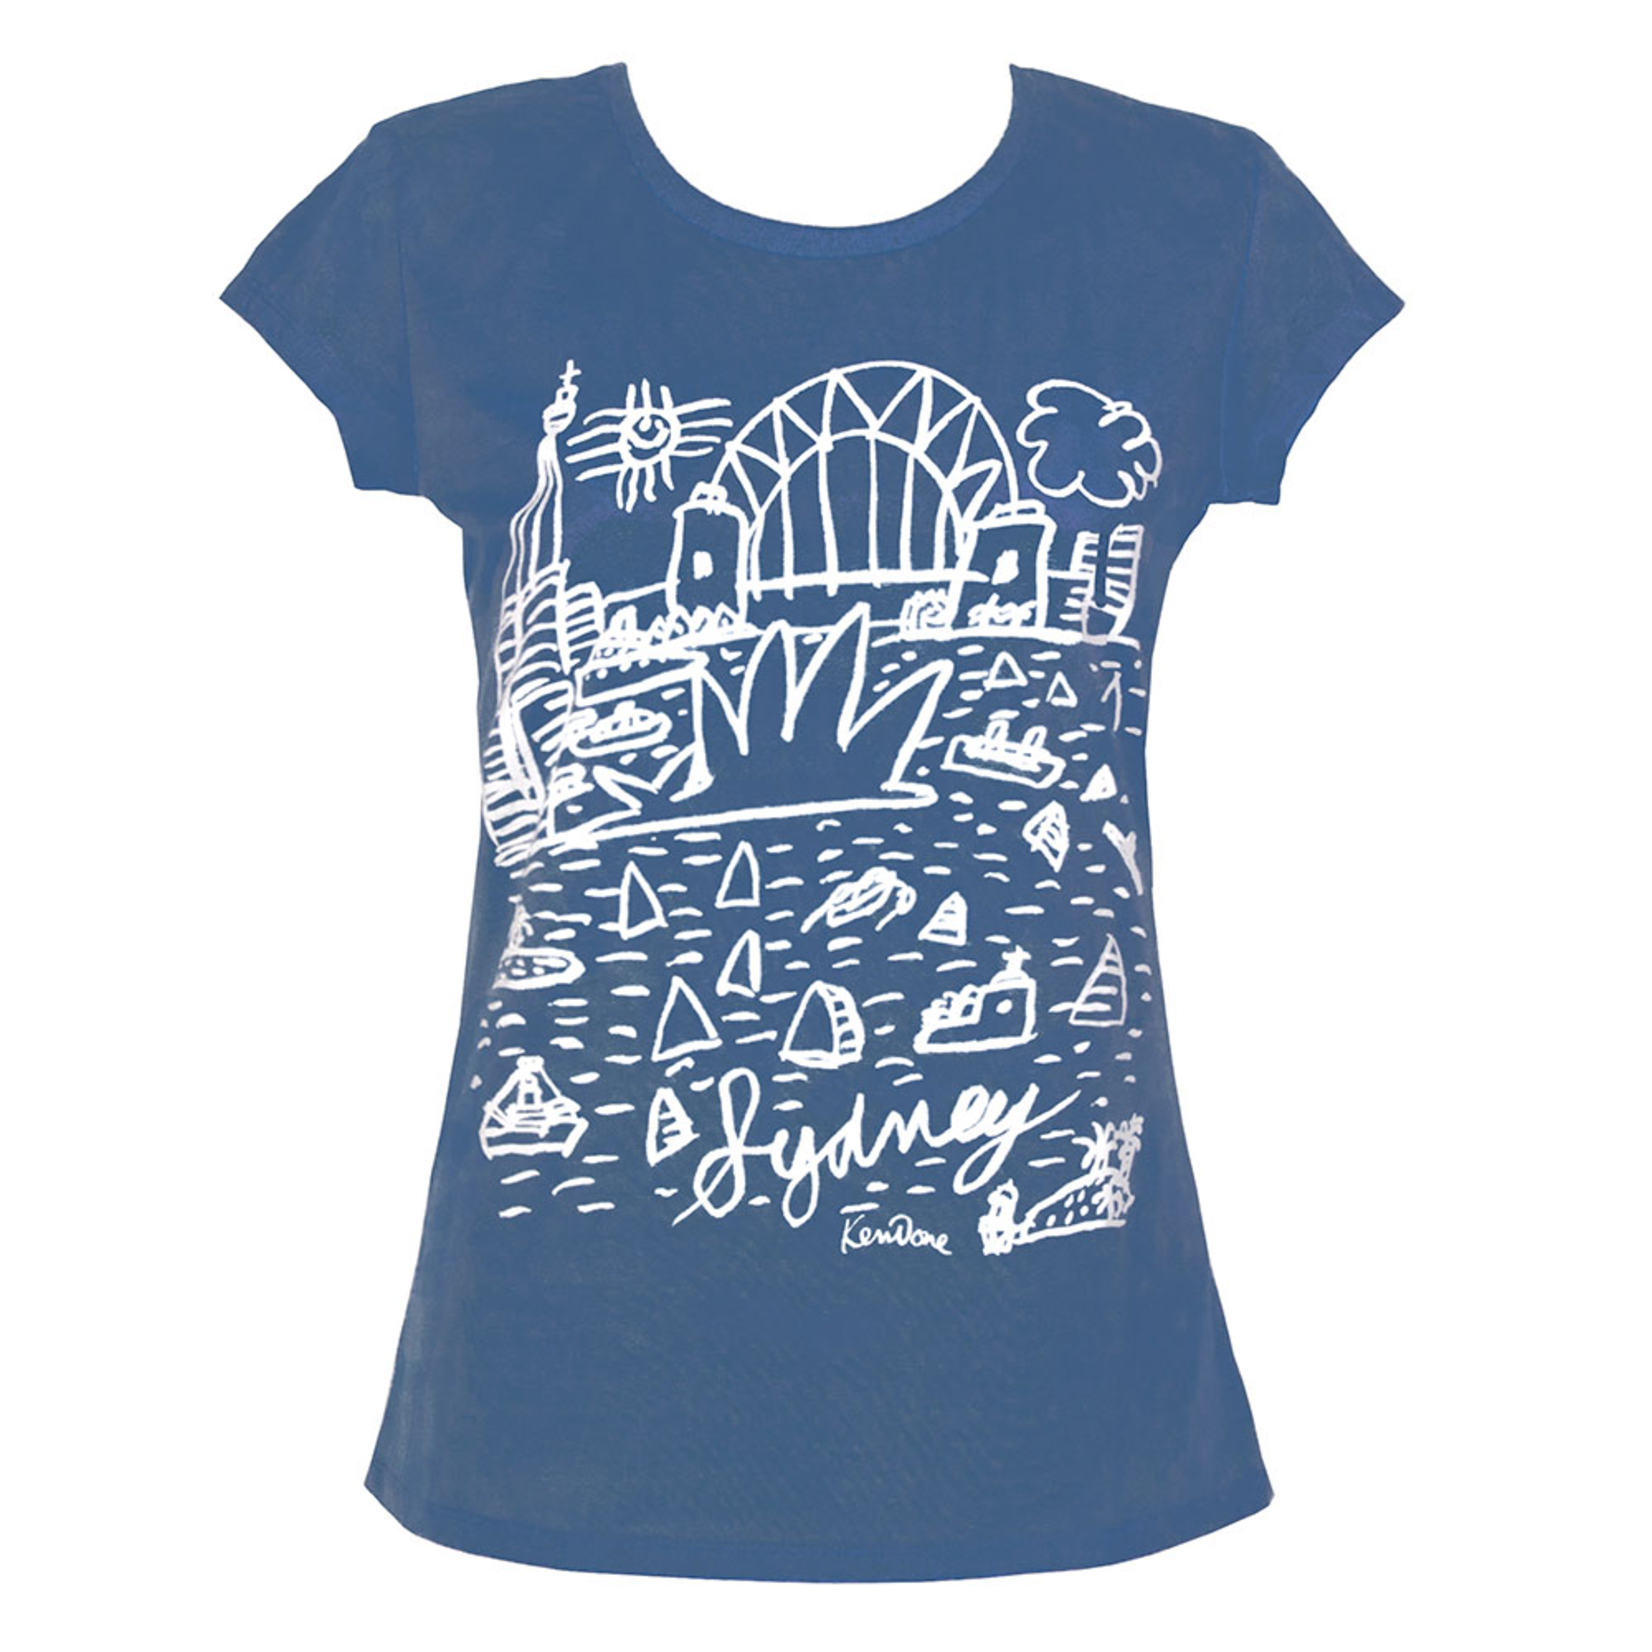 Clothing Tshirt - Fitted - Classic Sydney Blue